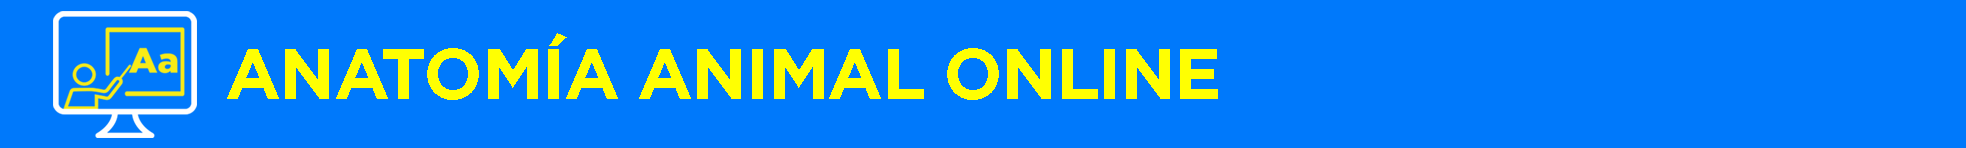 Banner título Anatomía animal Online